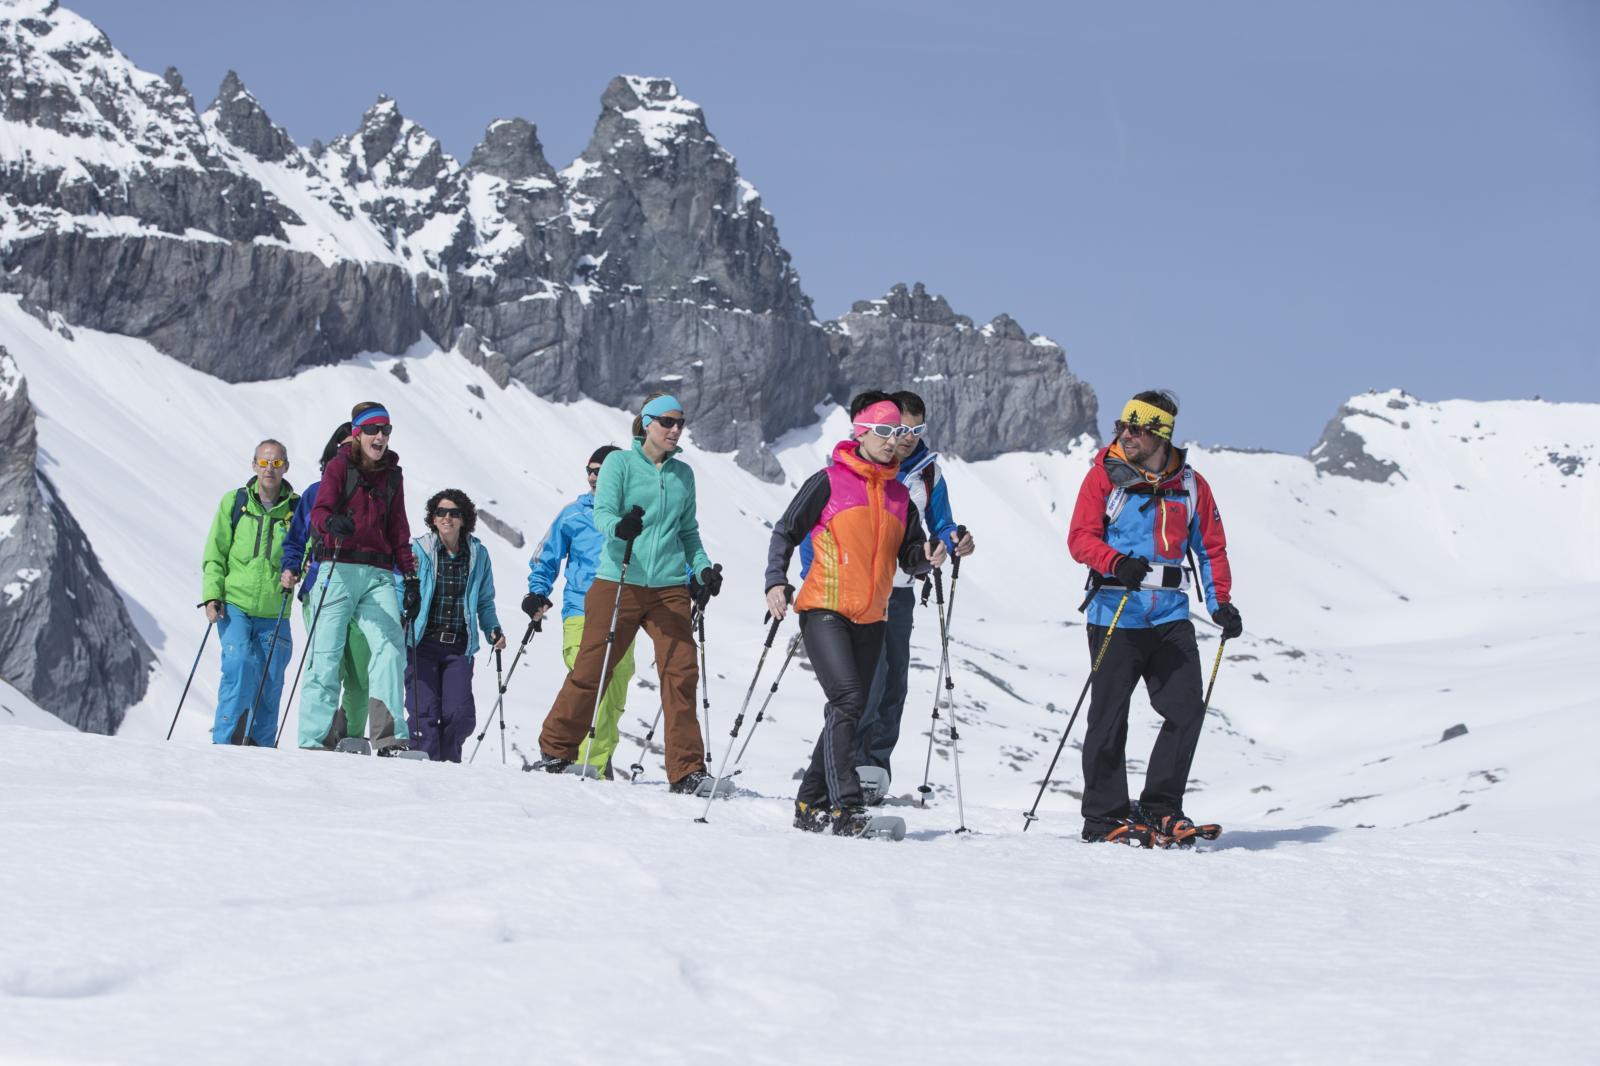 Winter im Welterbe Sardona